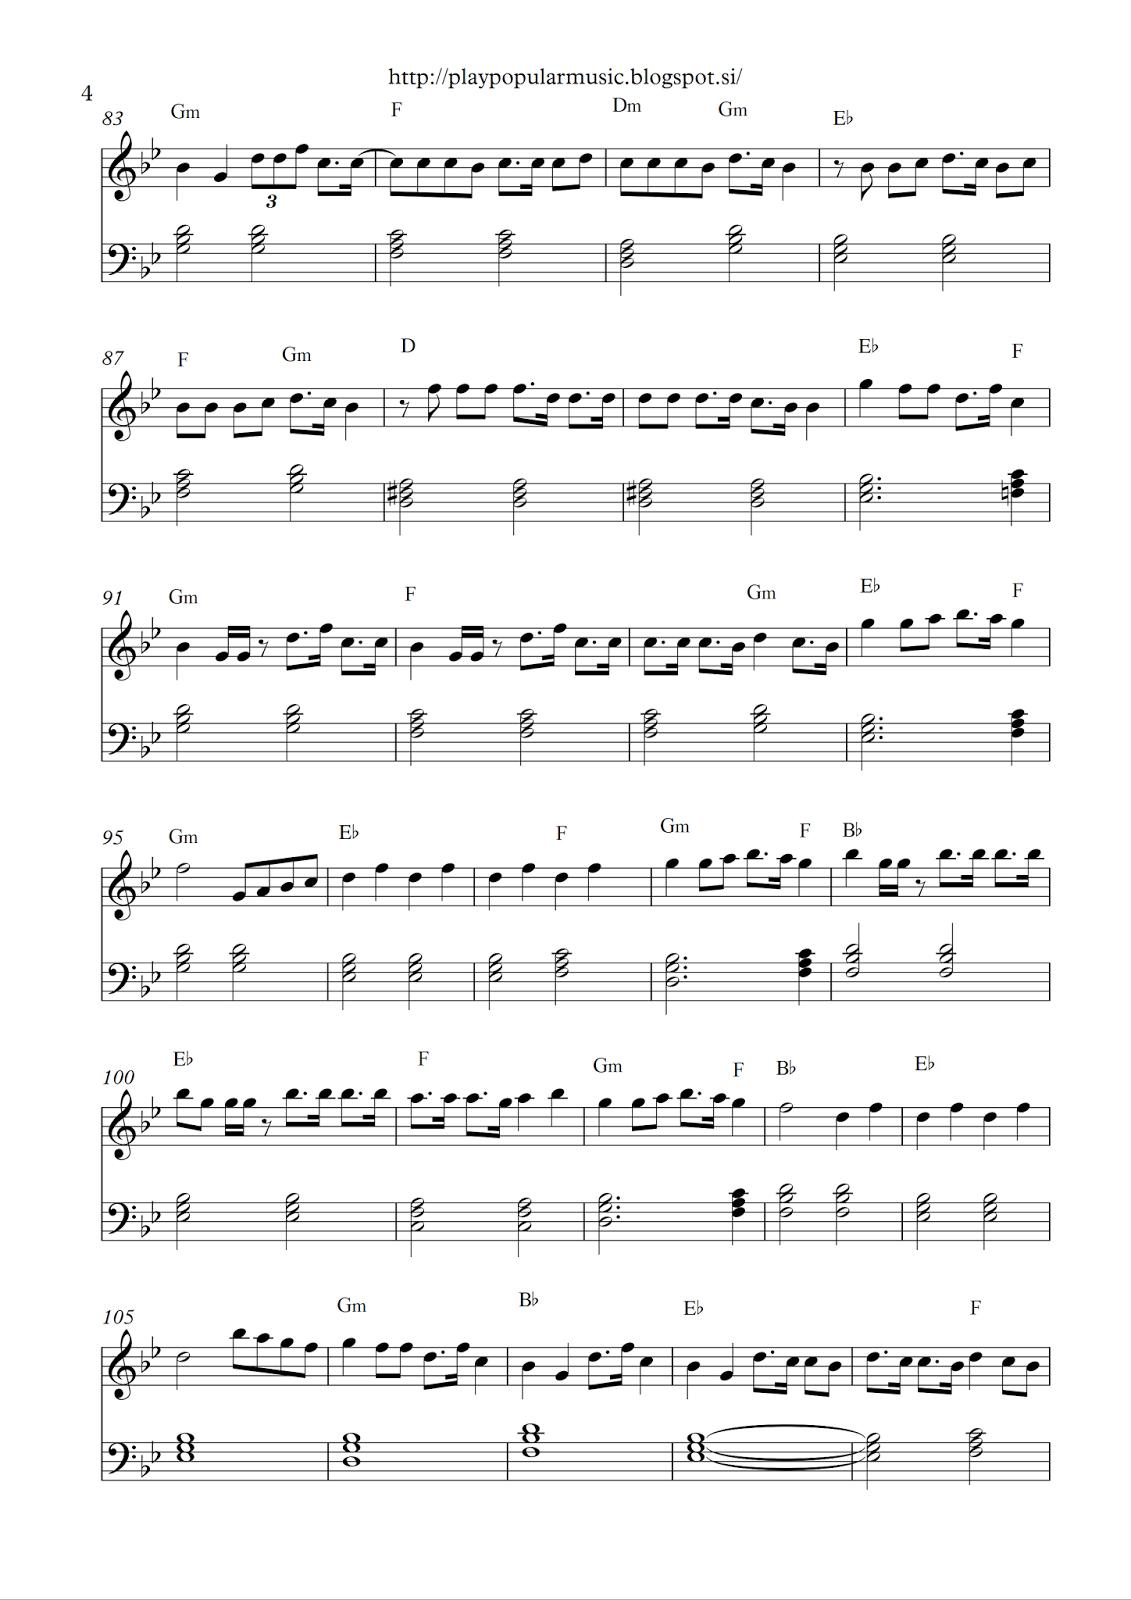 Free Full Piano Sheet Music 7 Years Lukas Graham Pdf My Favourite Sentence From The Lyrics Is Only Thos Sheet Music Free Sheet Music Piano Sheet Music